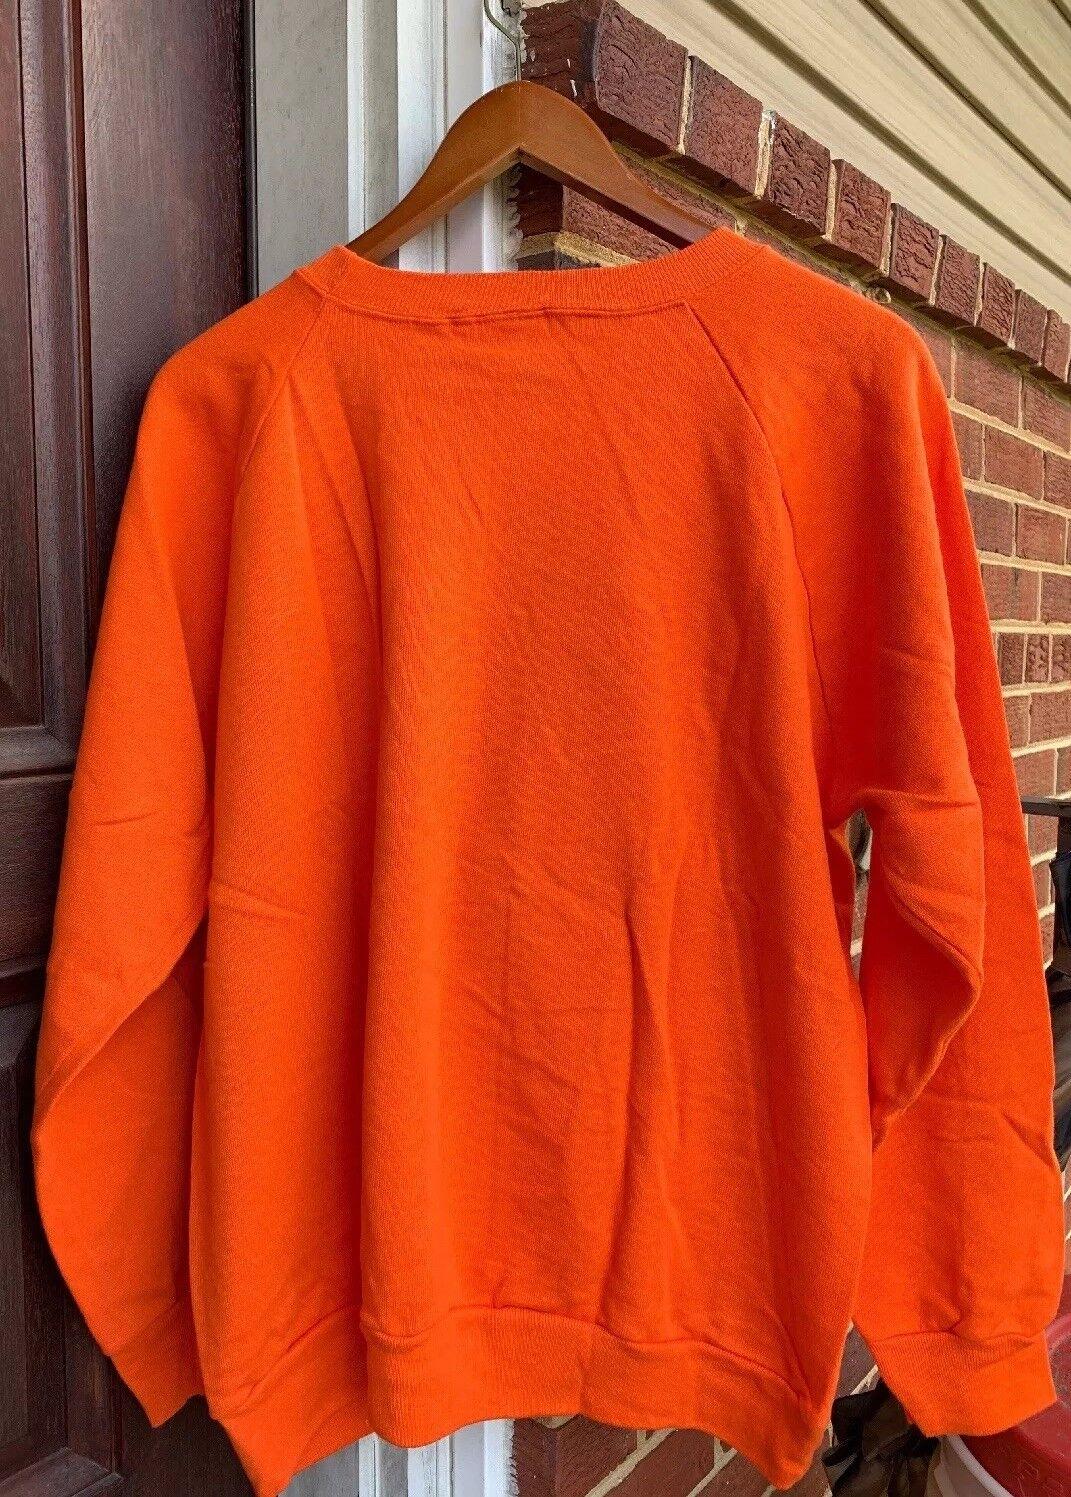 Vintage DENVER BRONCOS NFL Champion Brand 50/50% Cotton/ Poly Sweater. Size XL